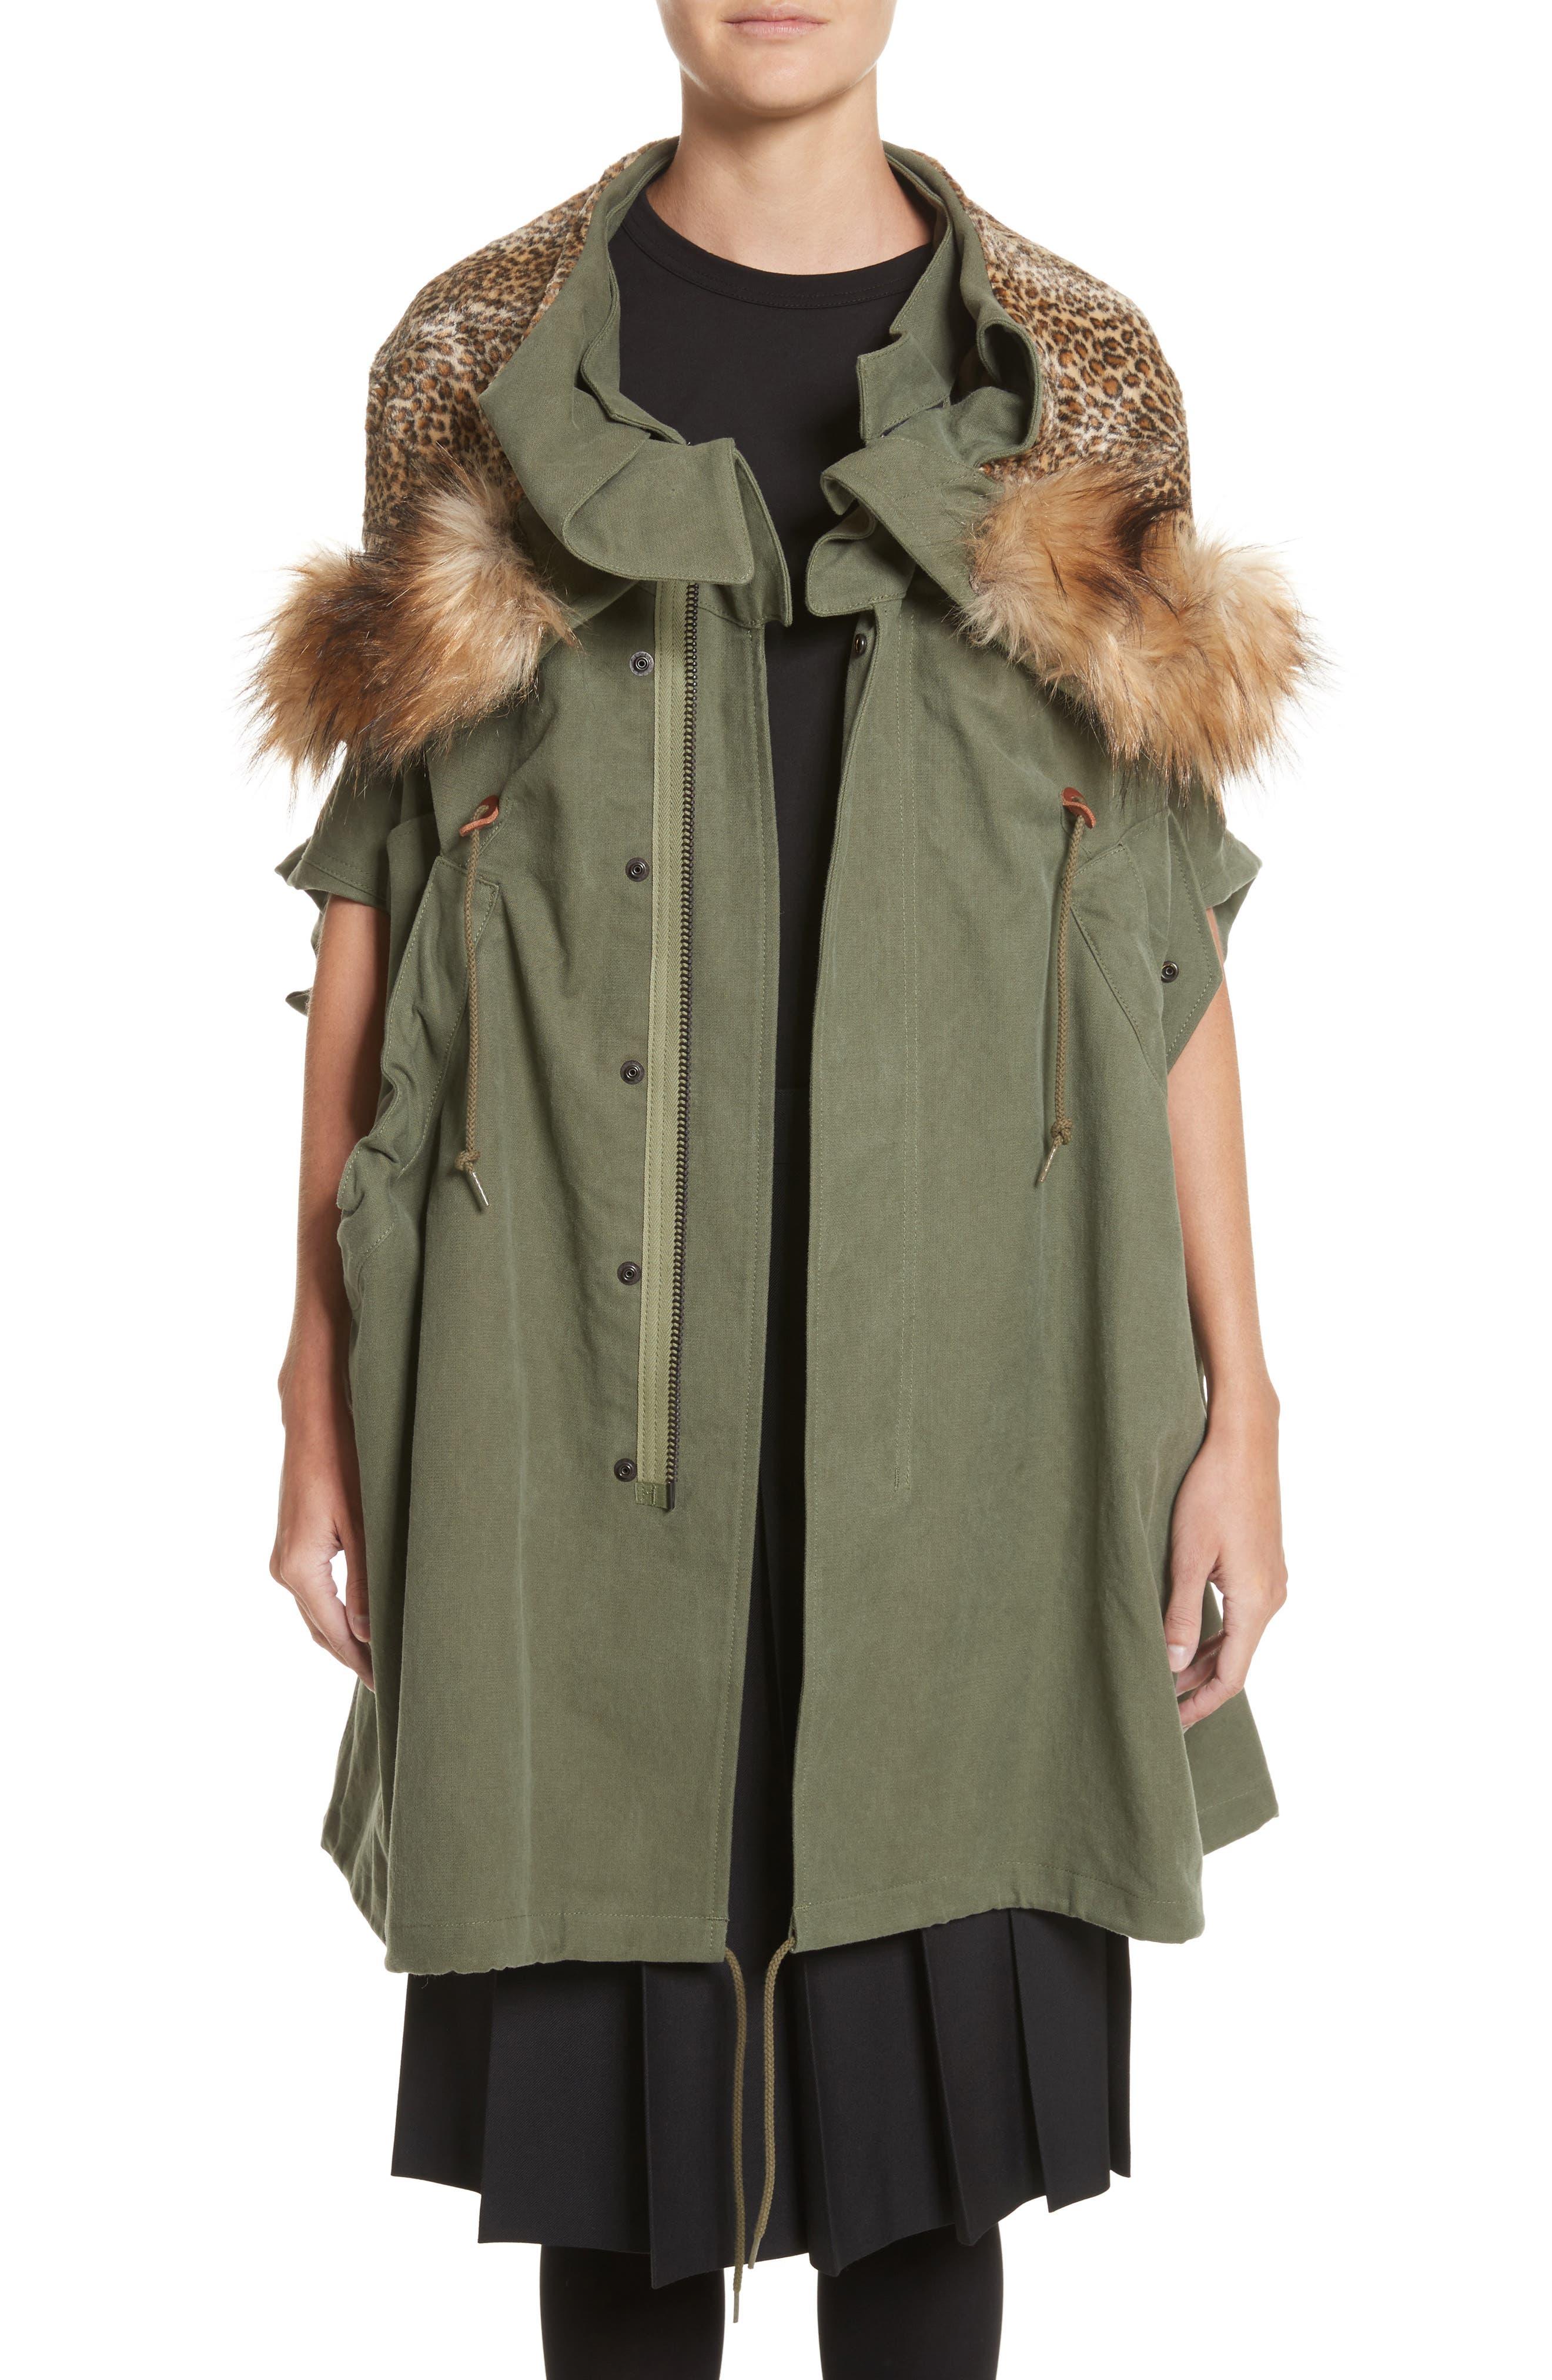 Army Coat with Cheetah Faux Fur Hood,                         Main,                         color, 340